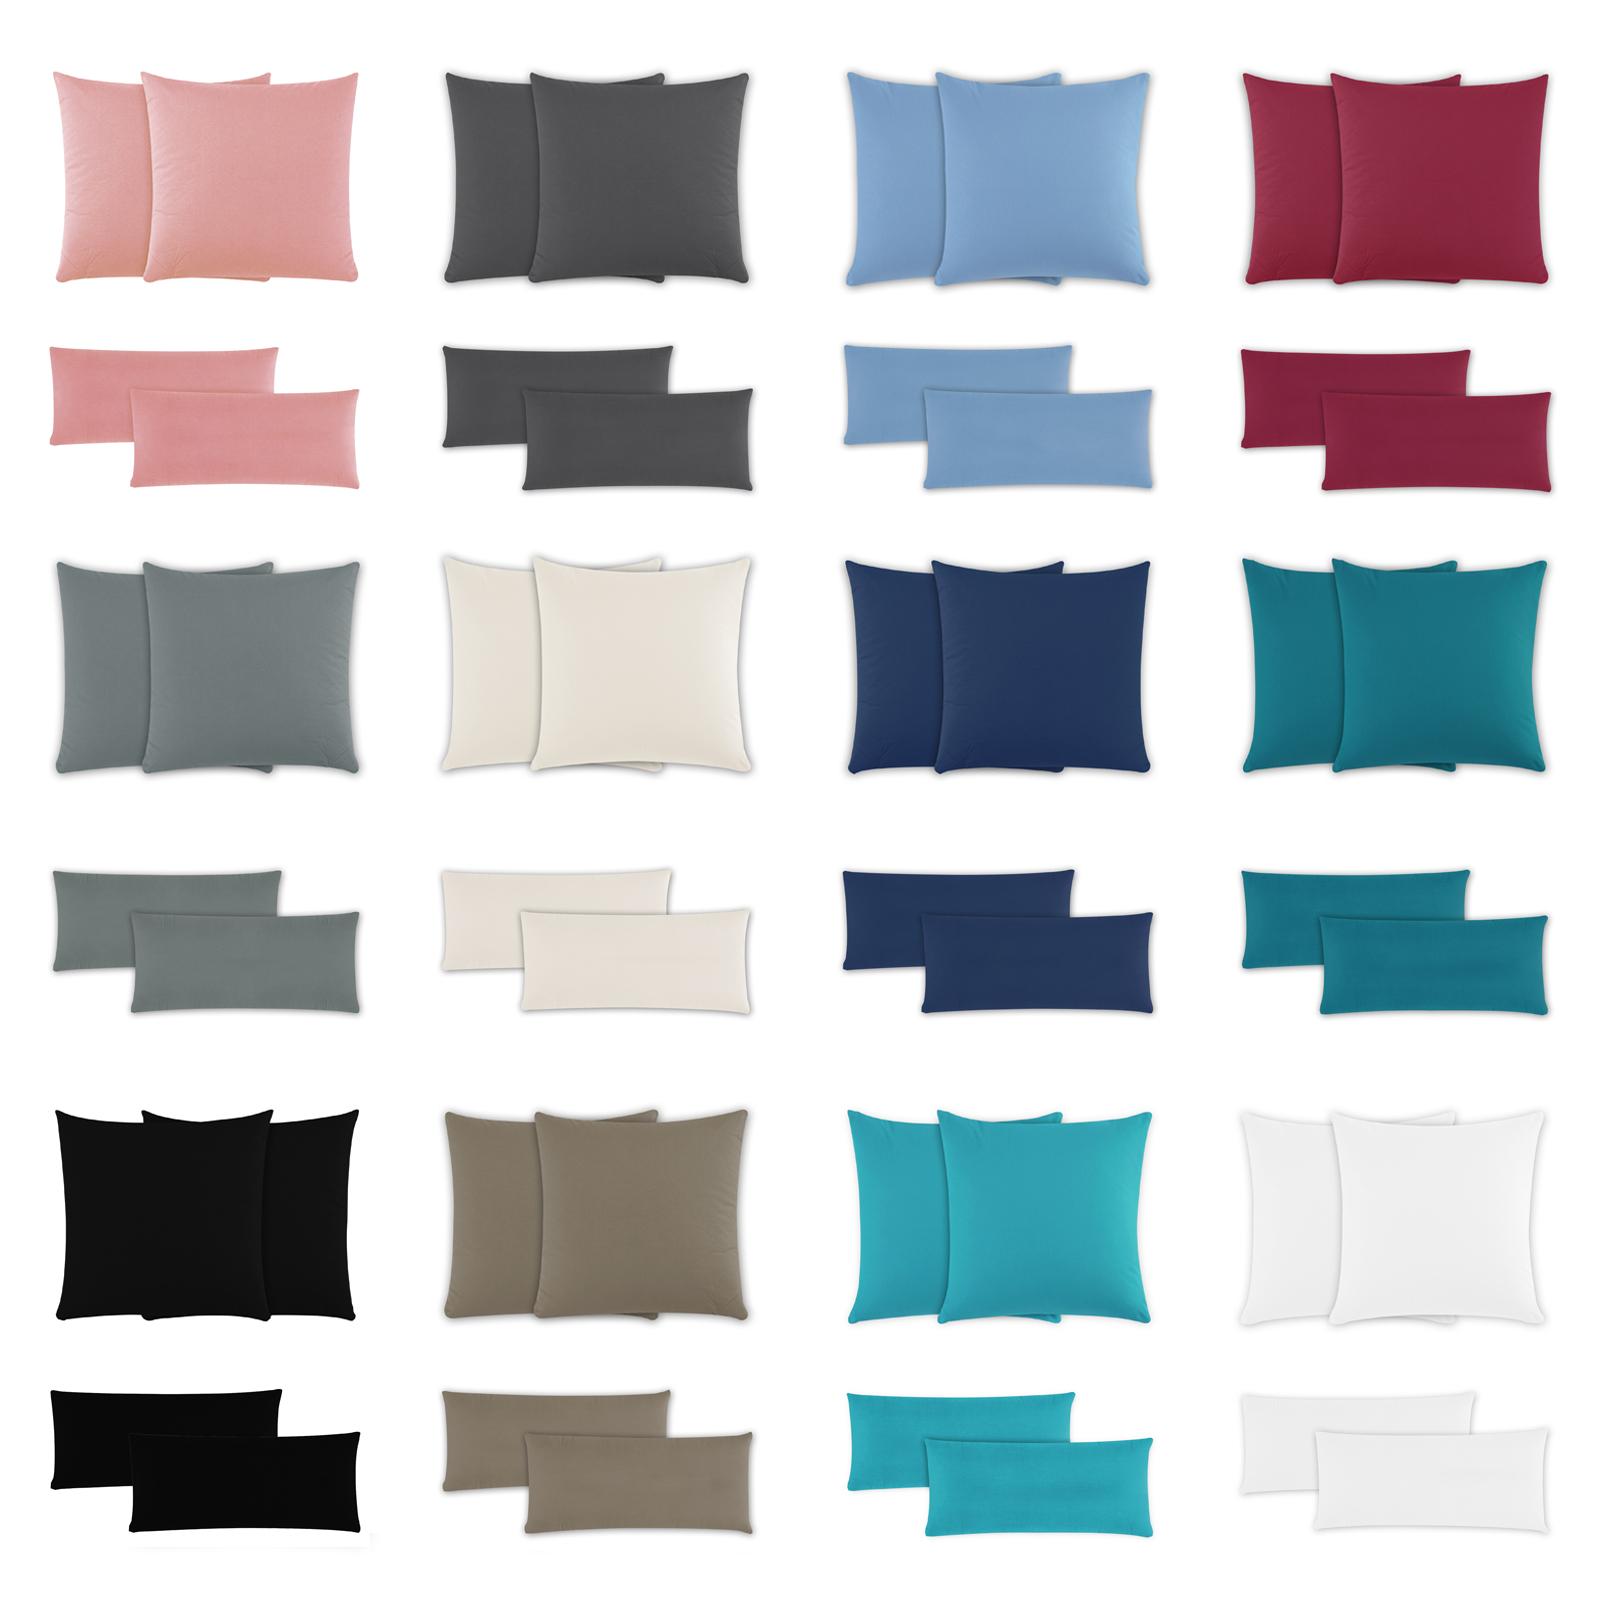 Kopfkissenbezug Kissenbezug Kissenhülle 40x80 cm Grau Baumwolle Reißverschluss